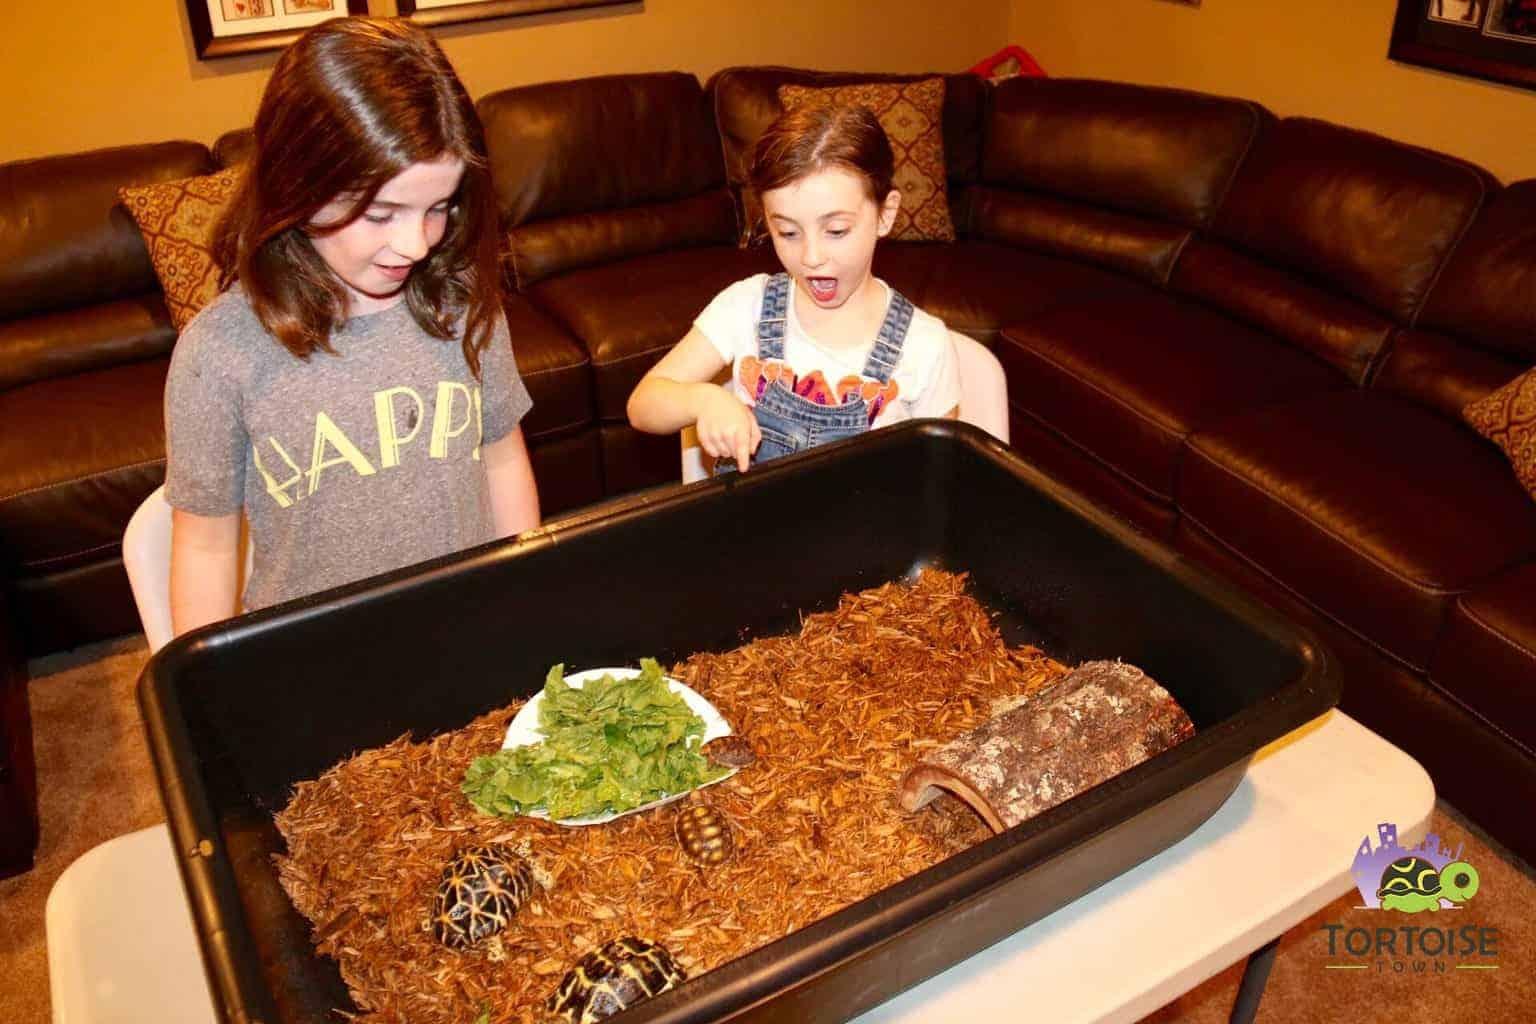 Tortoise Tub Box Turtle Tub For Sale Tortoise House